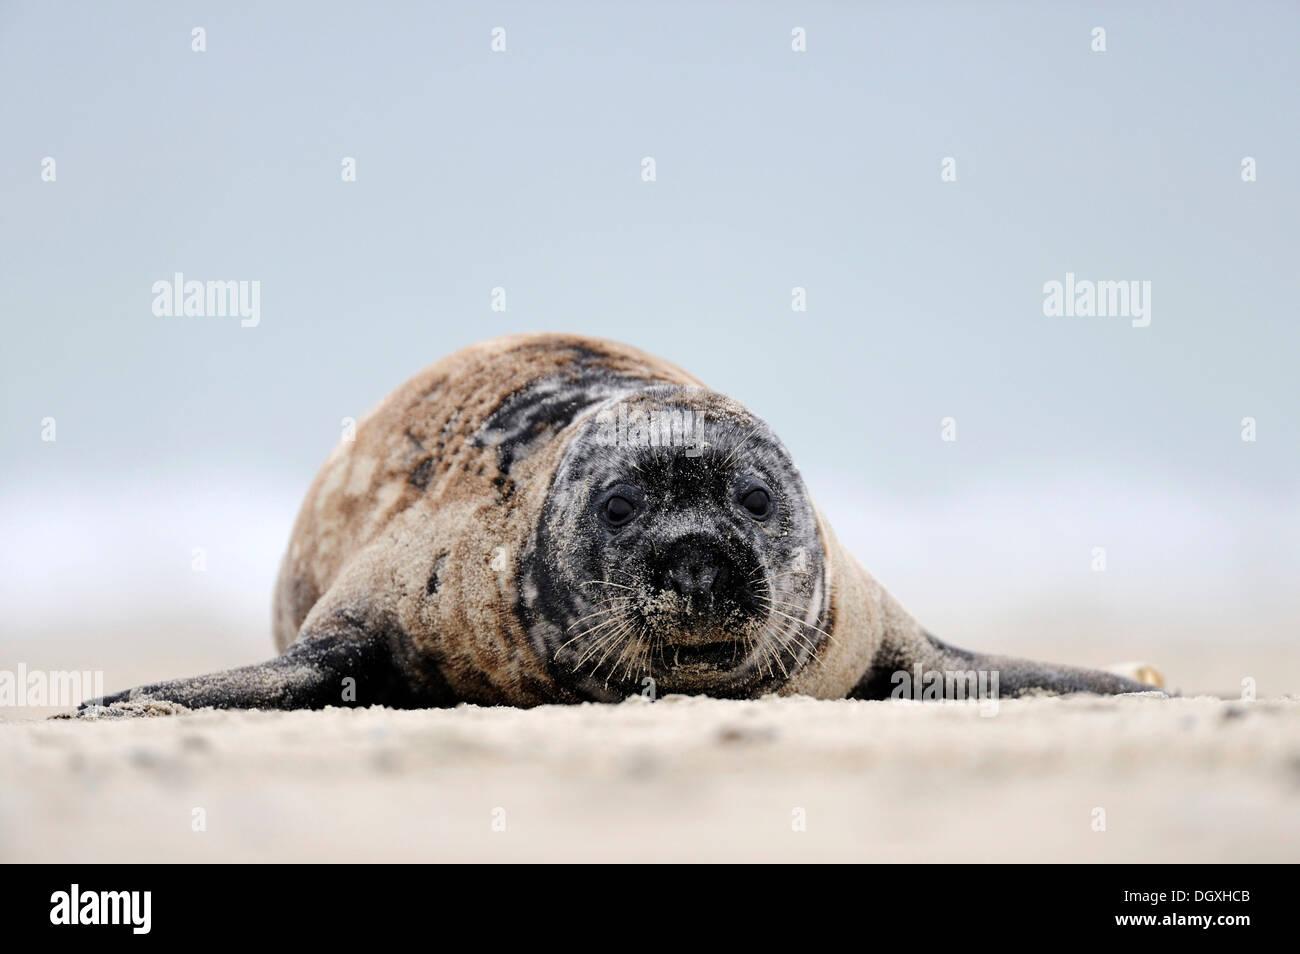 Gray seal (Halichoerus grypus), lying on a sand bank, ocean island, Helgoland, Schleswig-Holstein, Europe Stock Photo